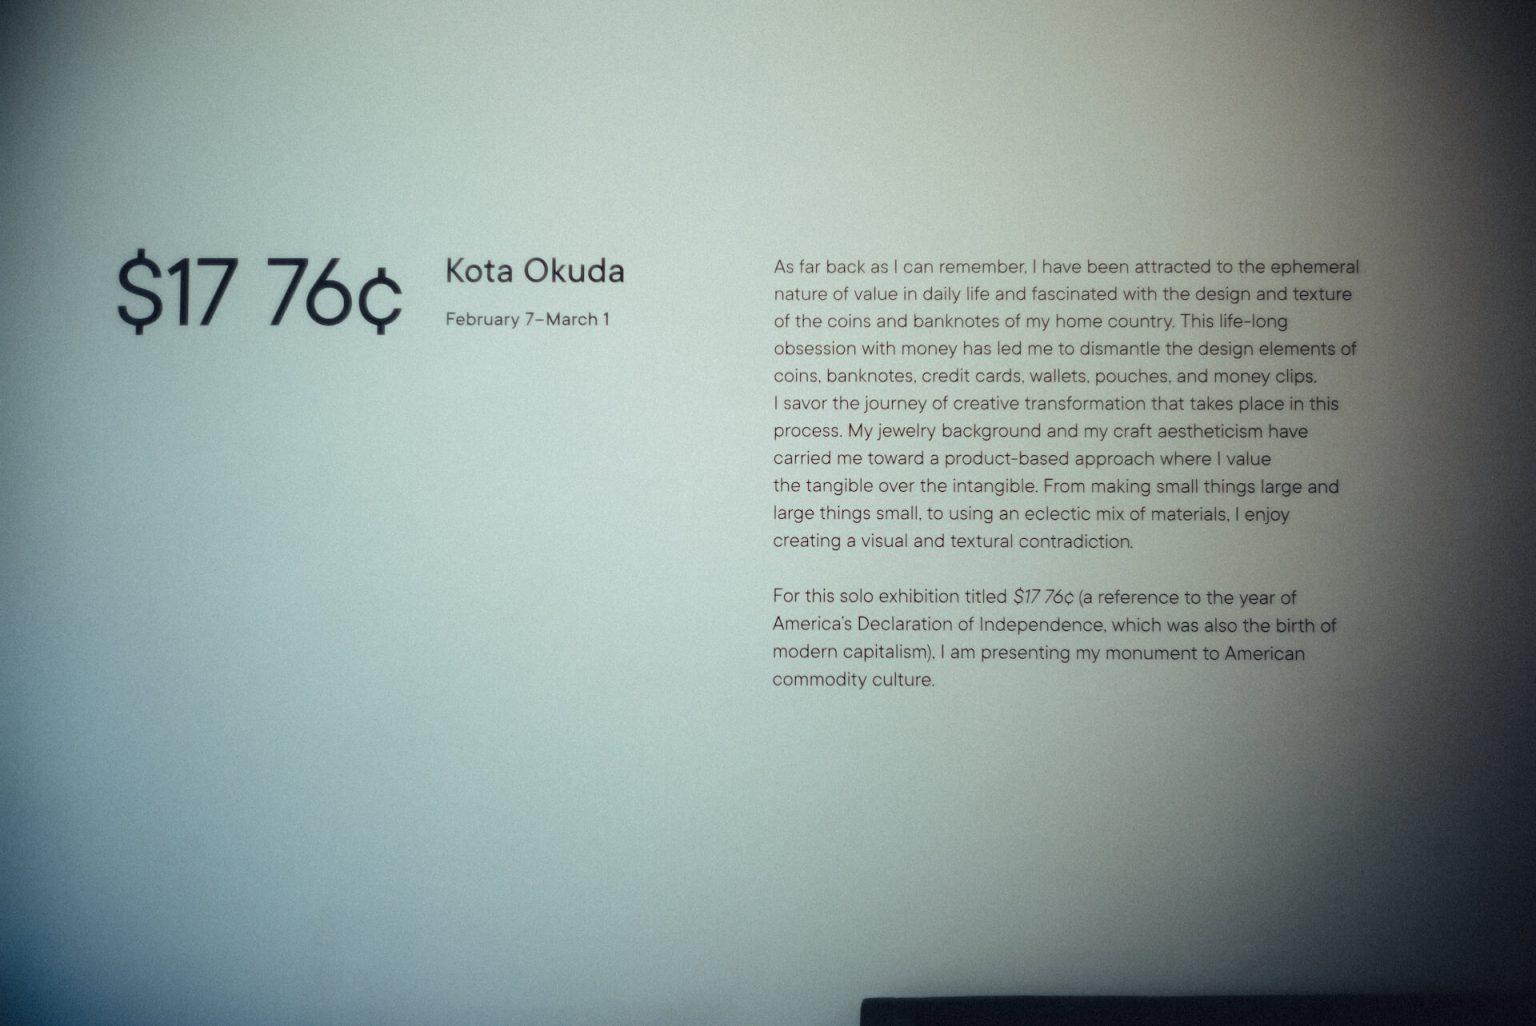 5_1720_AT_Okuda-1440x962 ジュエリーデザイナー「KOTA OKUDA」のNYC散策ルート。チェルシーの骨董市から、ハーレムのストリートで受けとる音と刺激